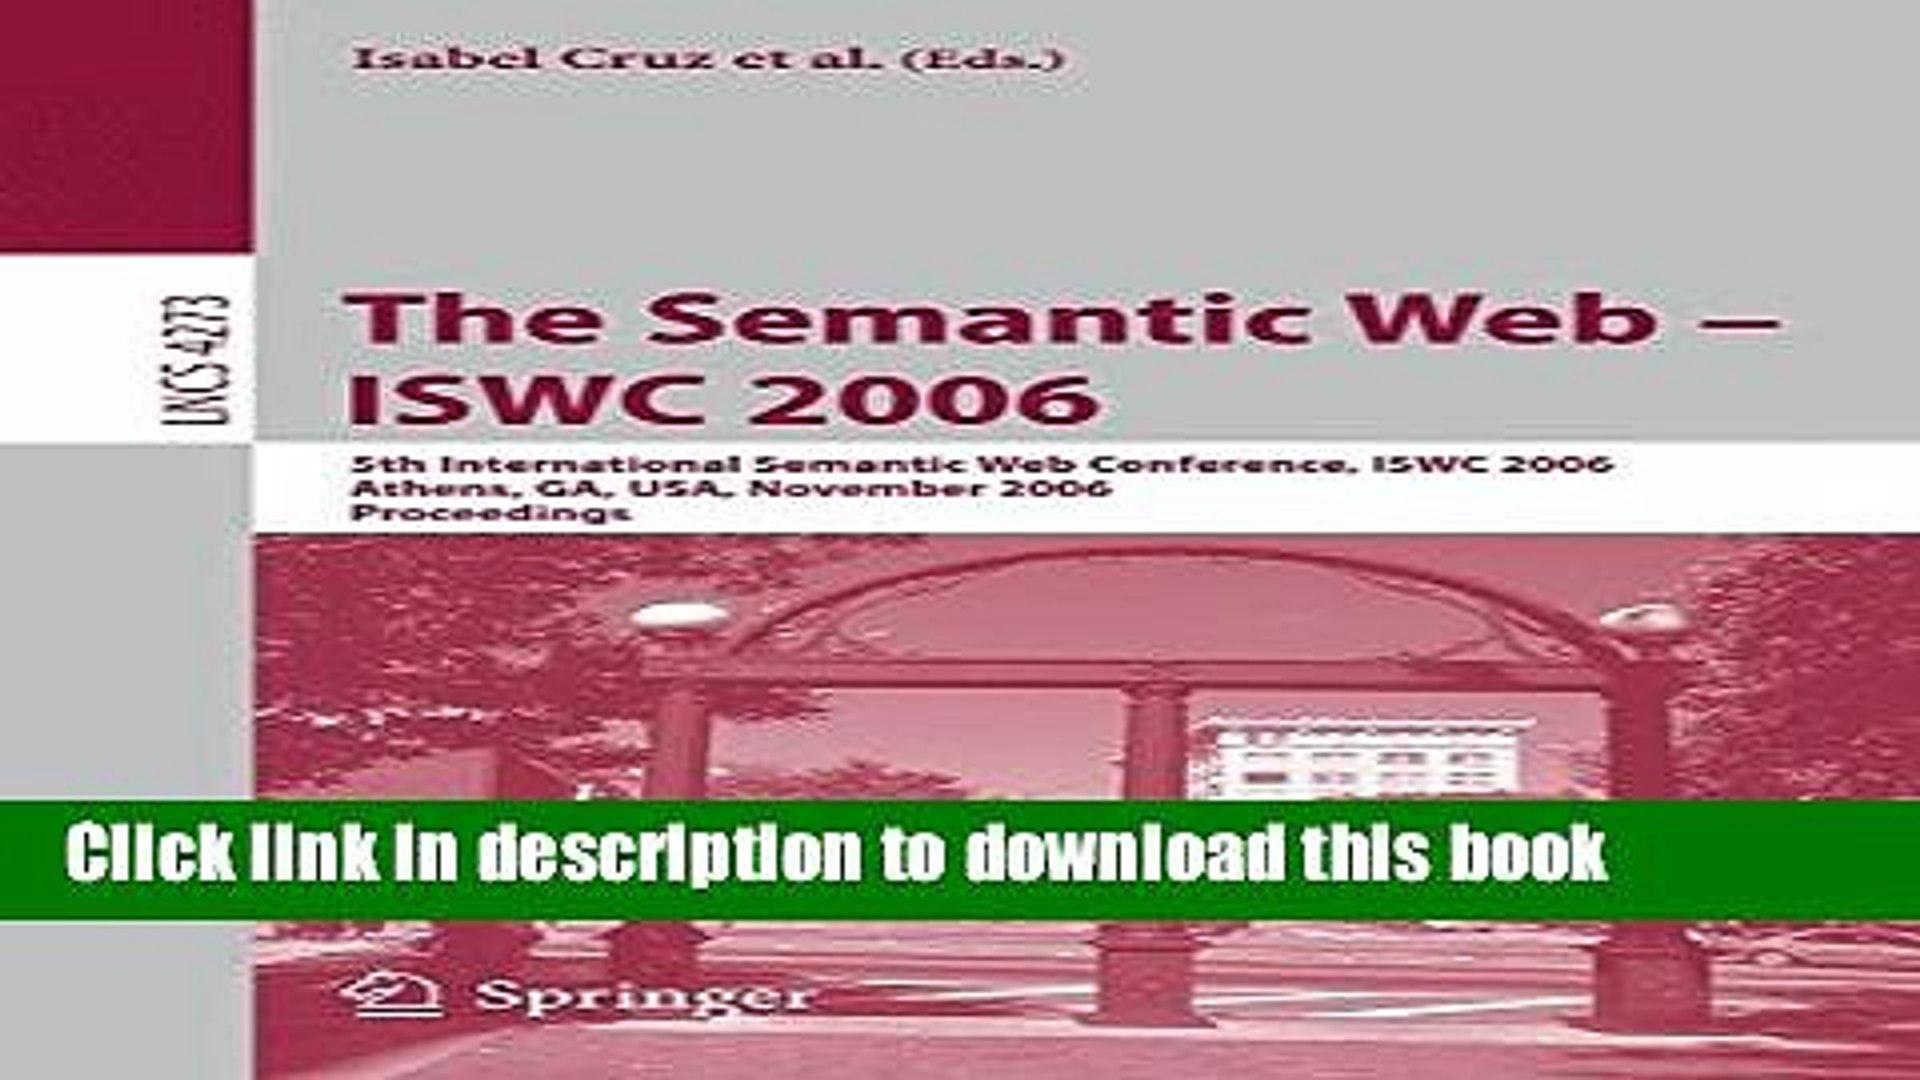 Read The Semantic Web - ISWC 2006: 5th International Semantic Web Conference, ISWC 2006, Athens,